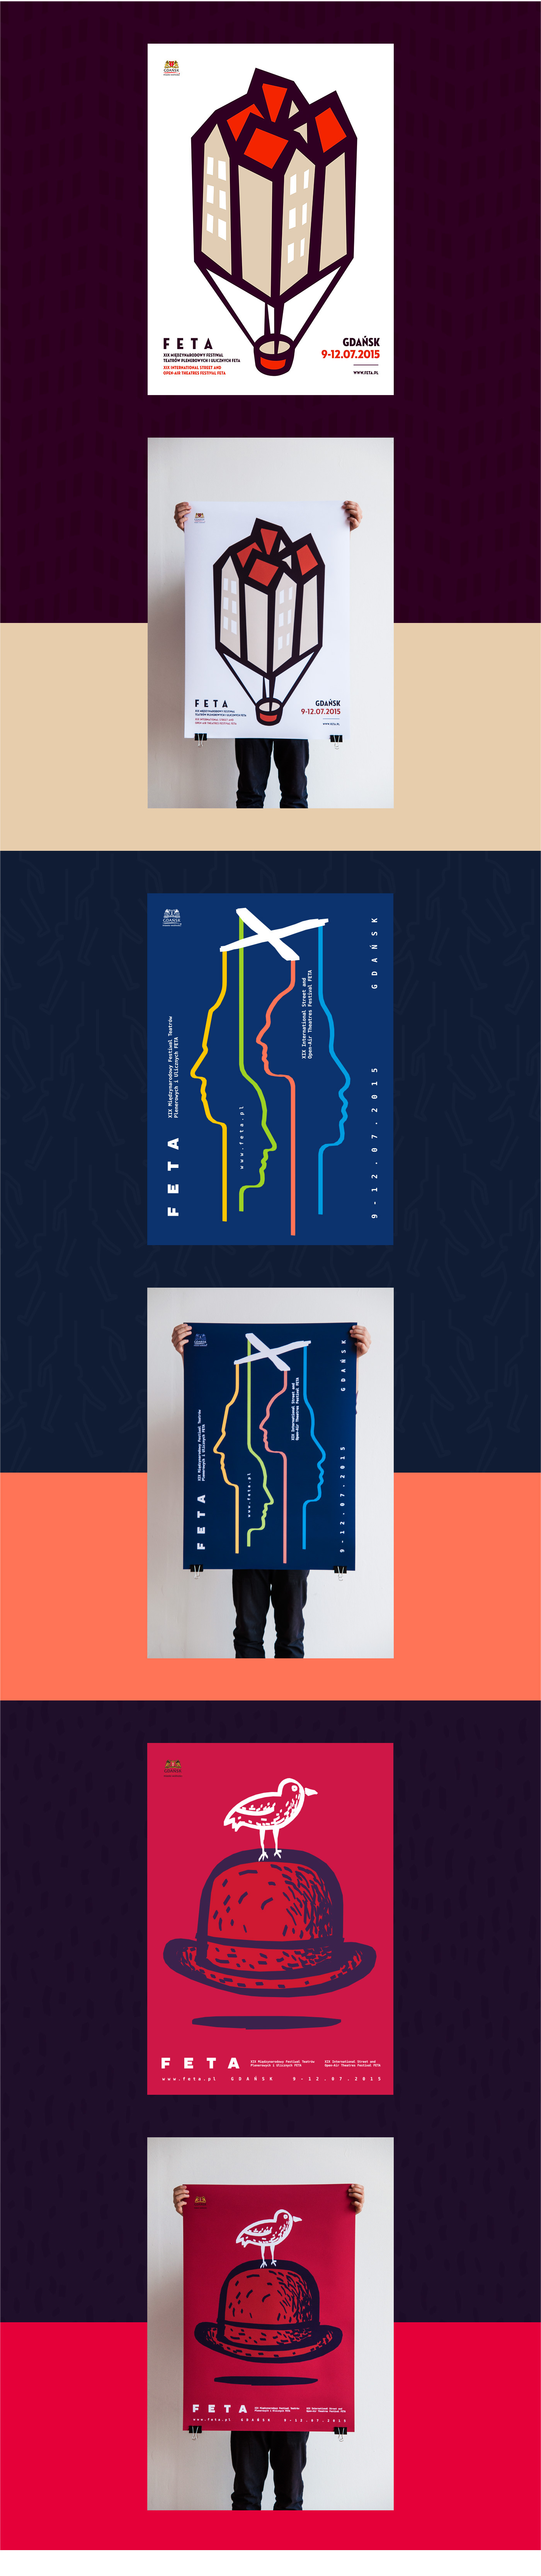 feta posters plakaty poster ILUSTRACJE Theatre Biennale plakat polish teatr art